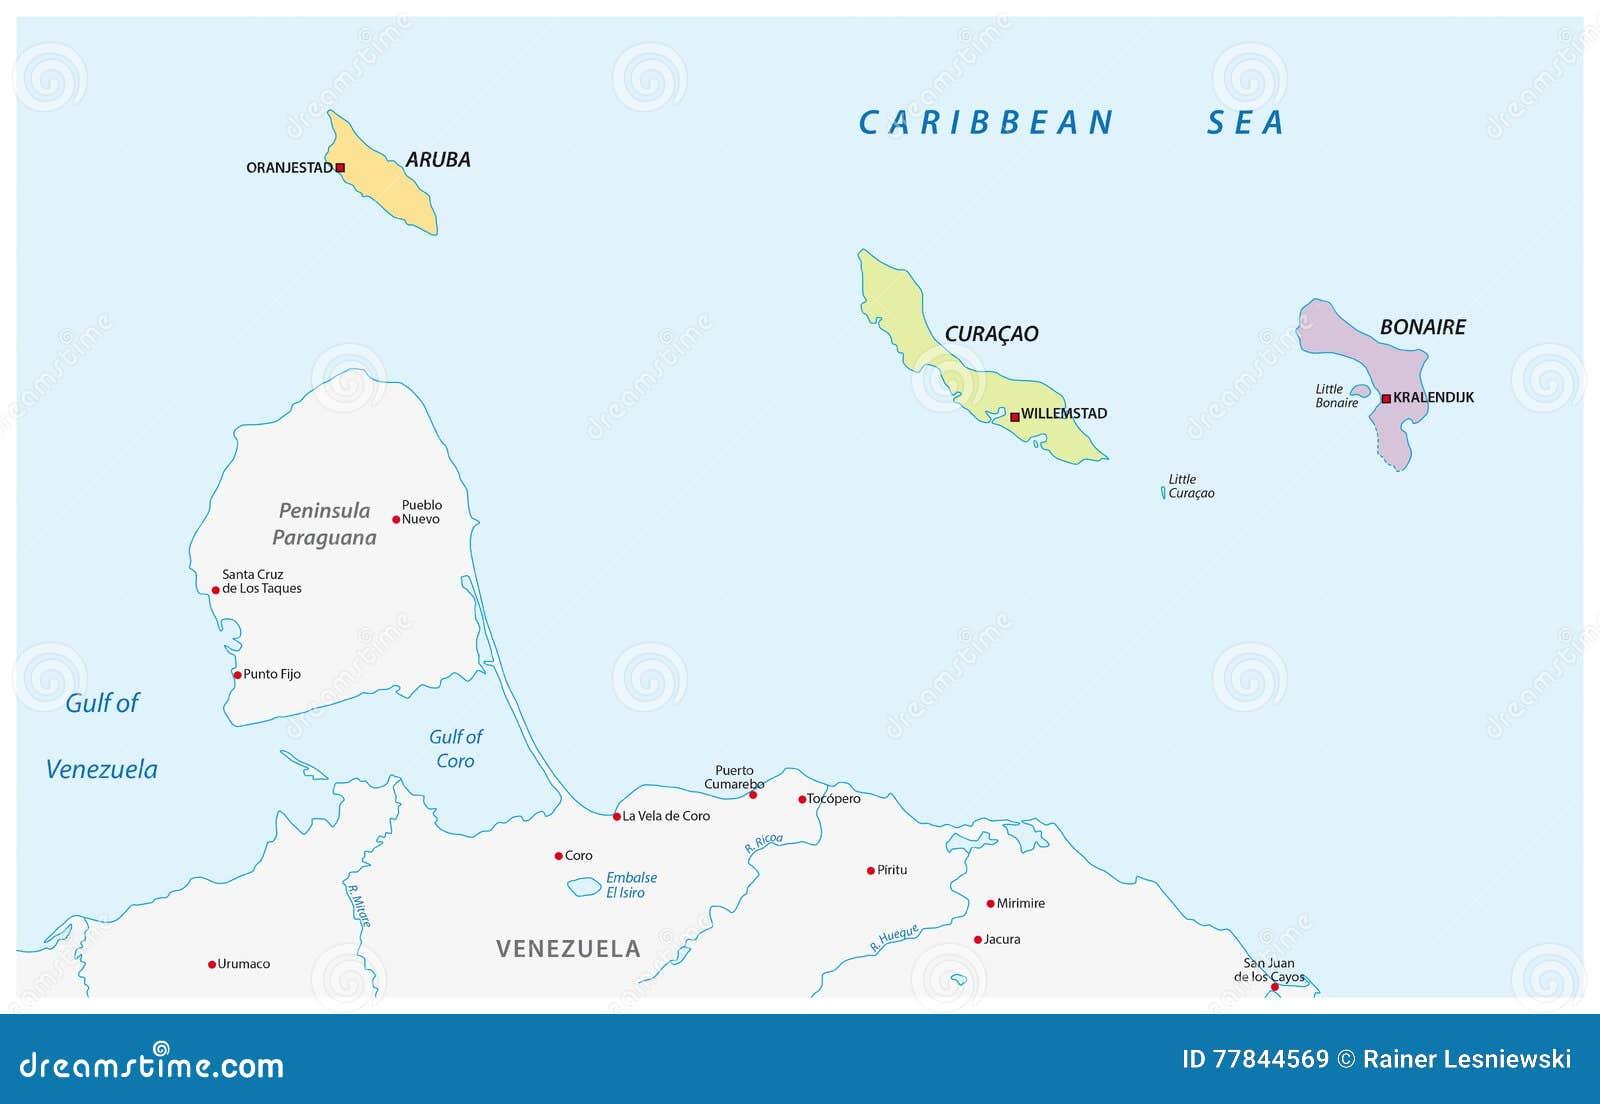 Aruba Karte Karibik.Karte Der Abc Inseln Im Karibischen Meer Stock Abbildung